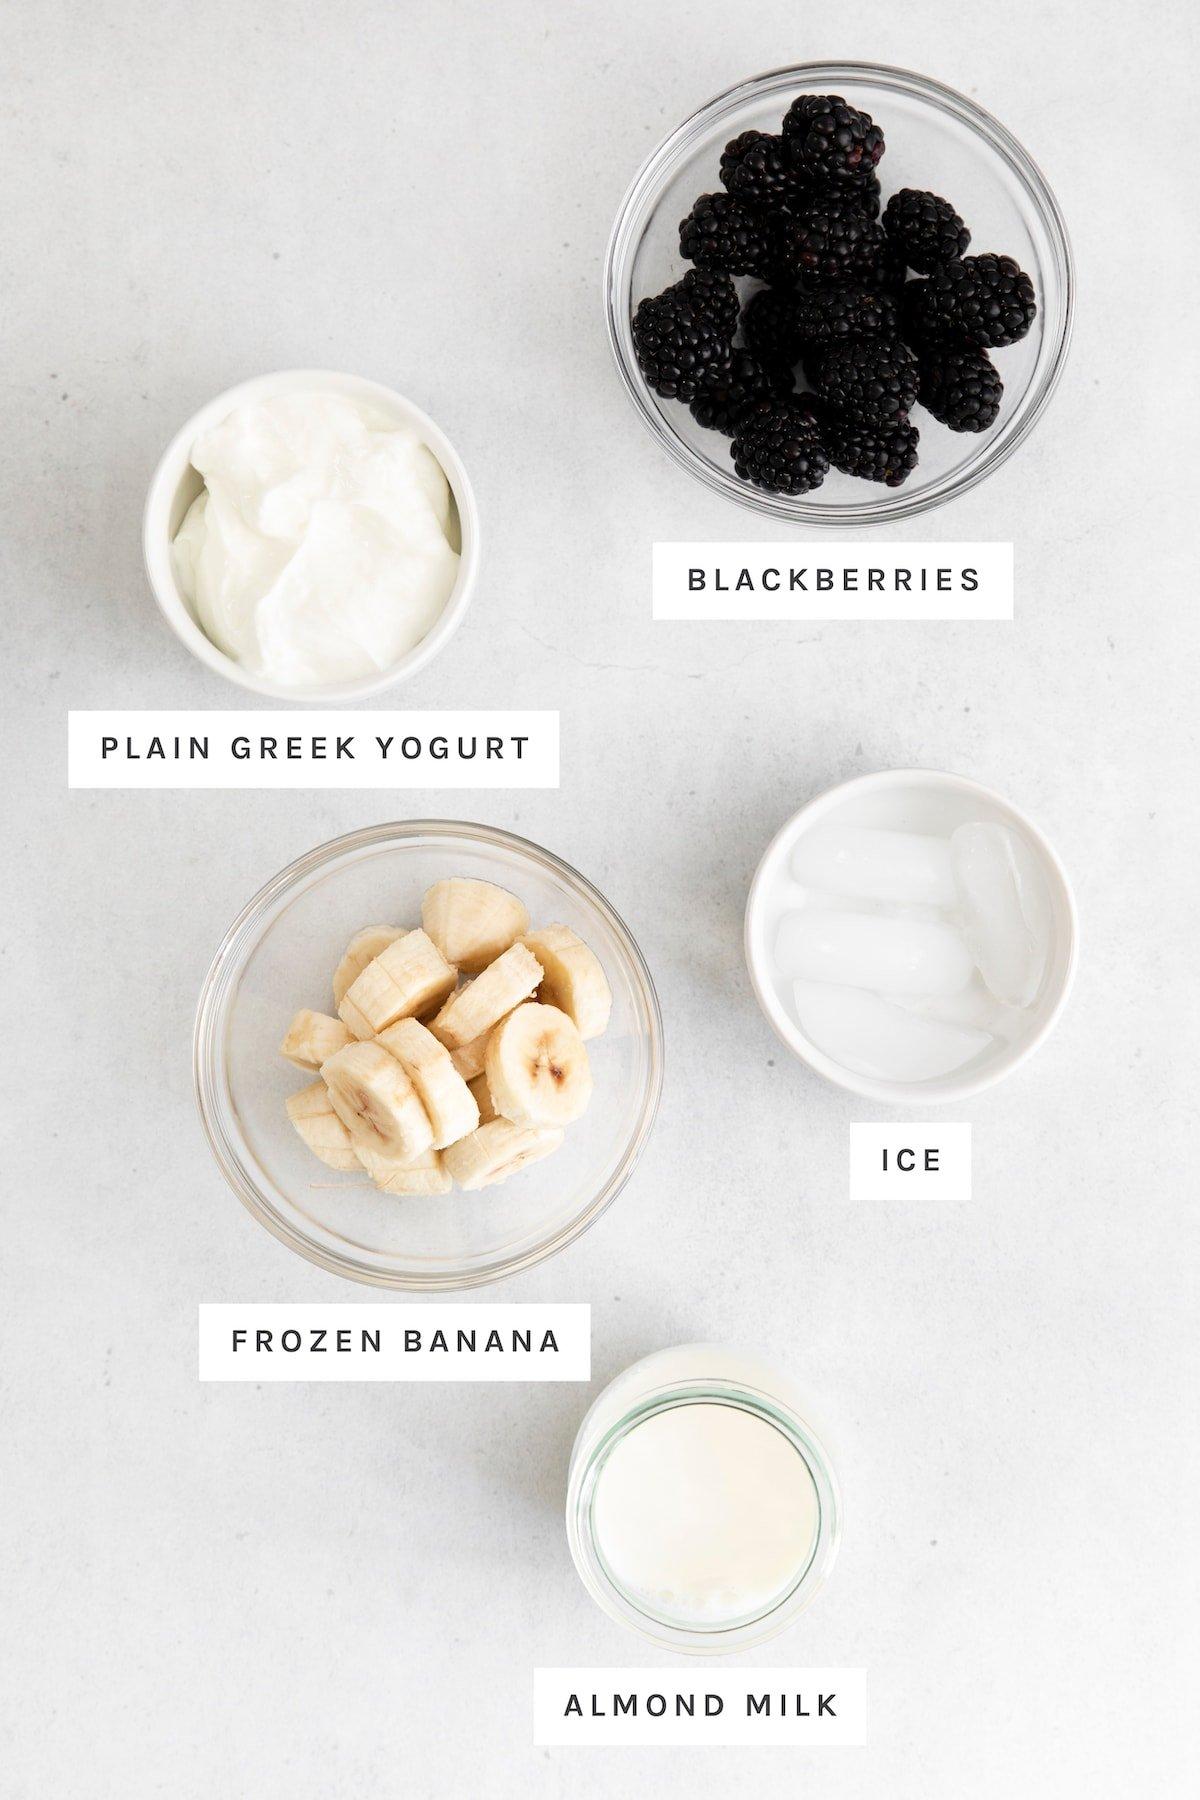 Measured out ingredients in bowls for blackberries, greek yogurt, ice, frozen banana and almond milk.